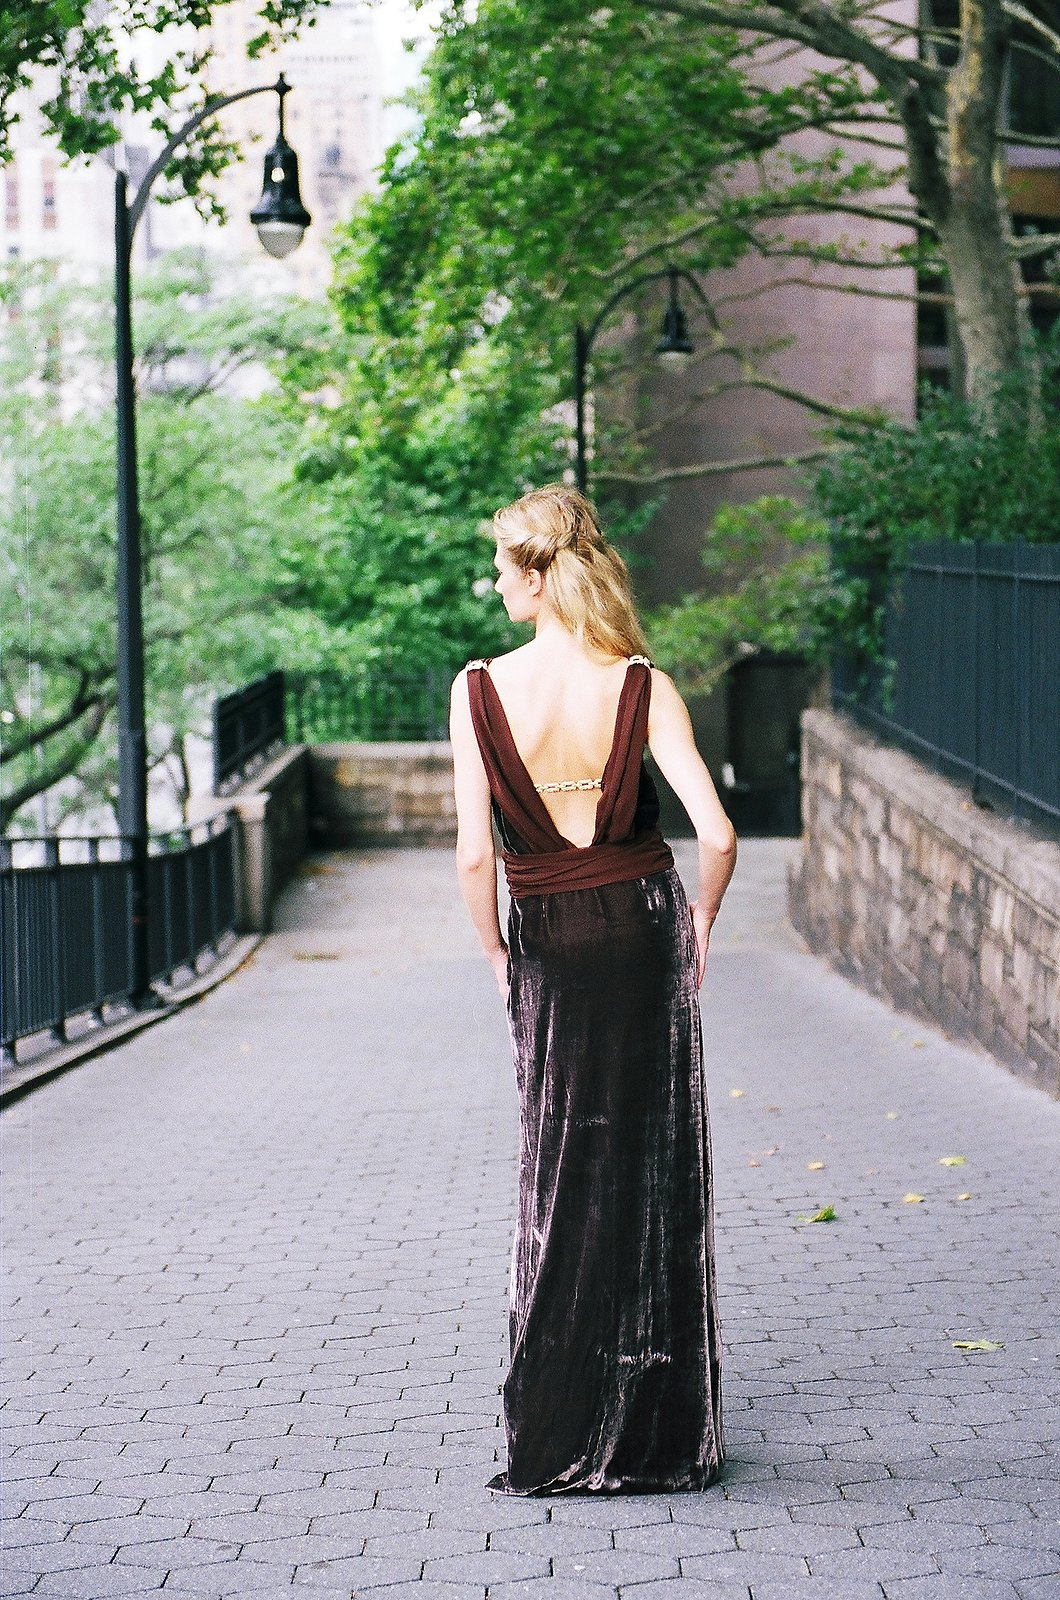 bridesmaid in long brown velvet dress